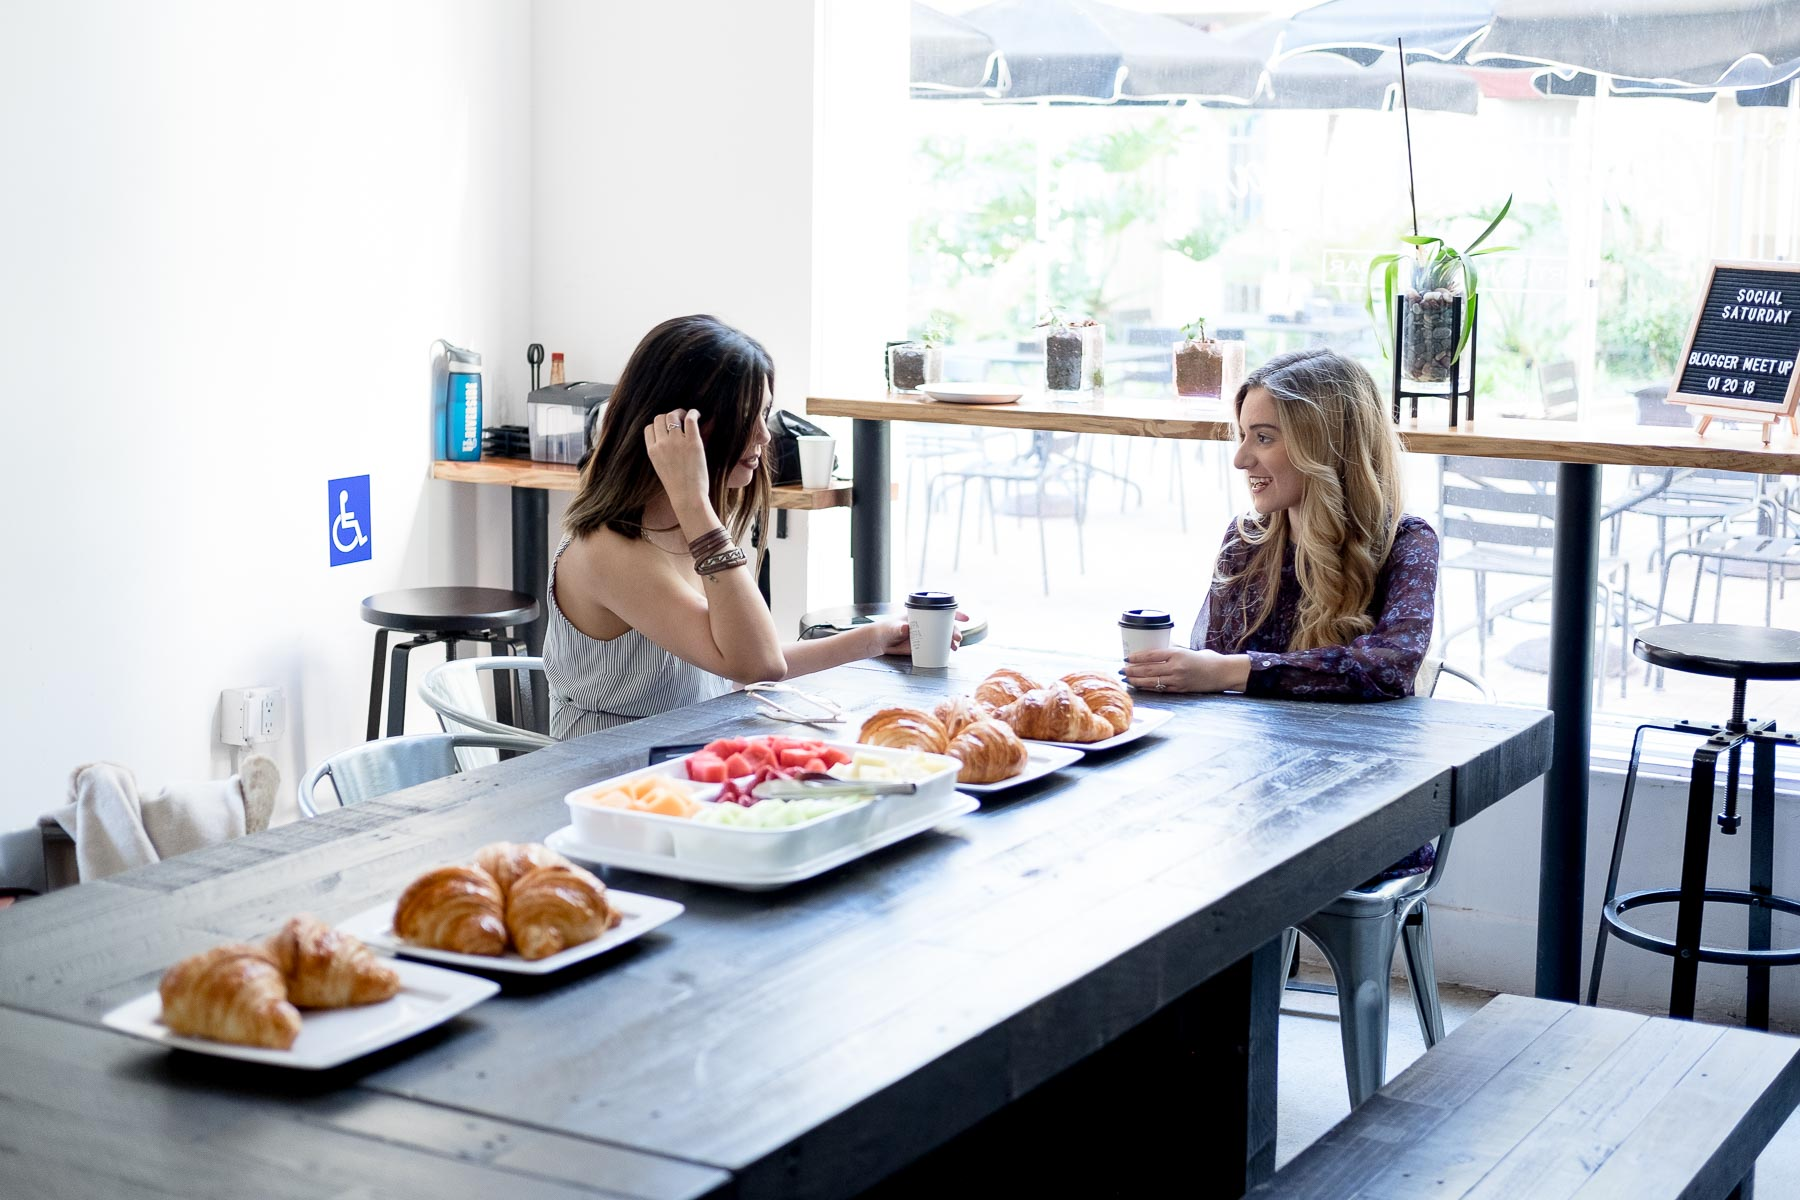 Rachel Off Duty: How to Start Networking - Cuppa Cuppa Coffee Shop